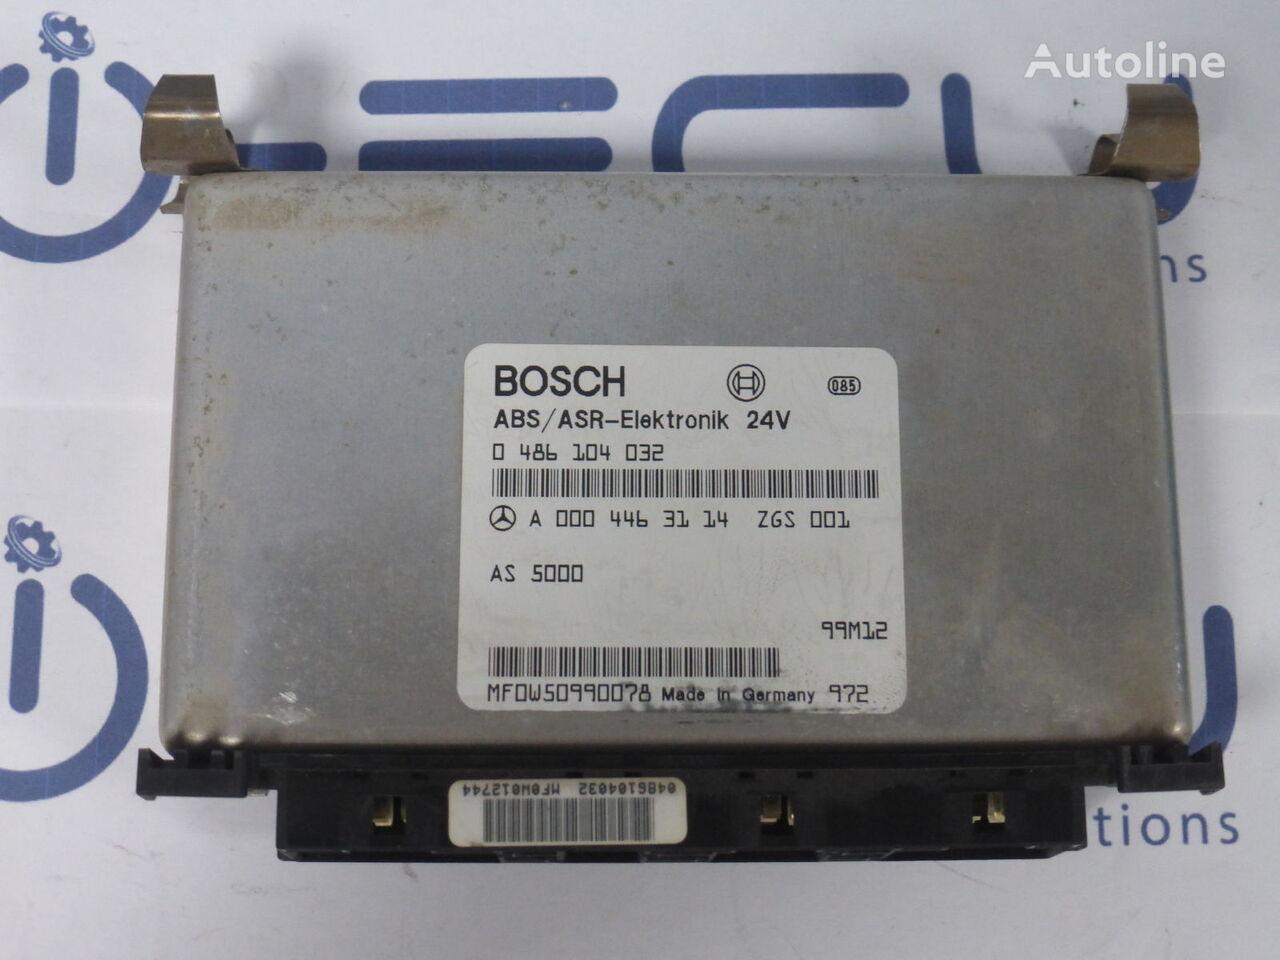 BOSCH 0004463114 control unit for MERCEDES-BENZ ATEGO truck